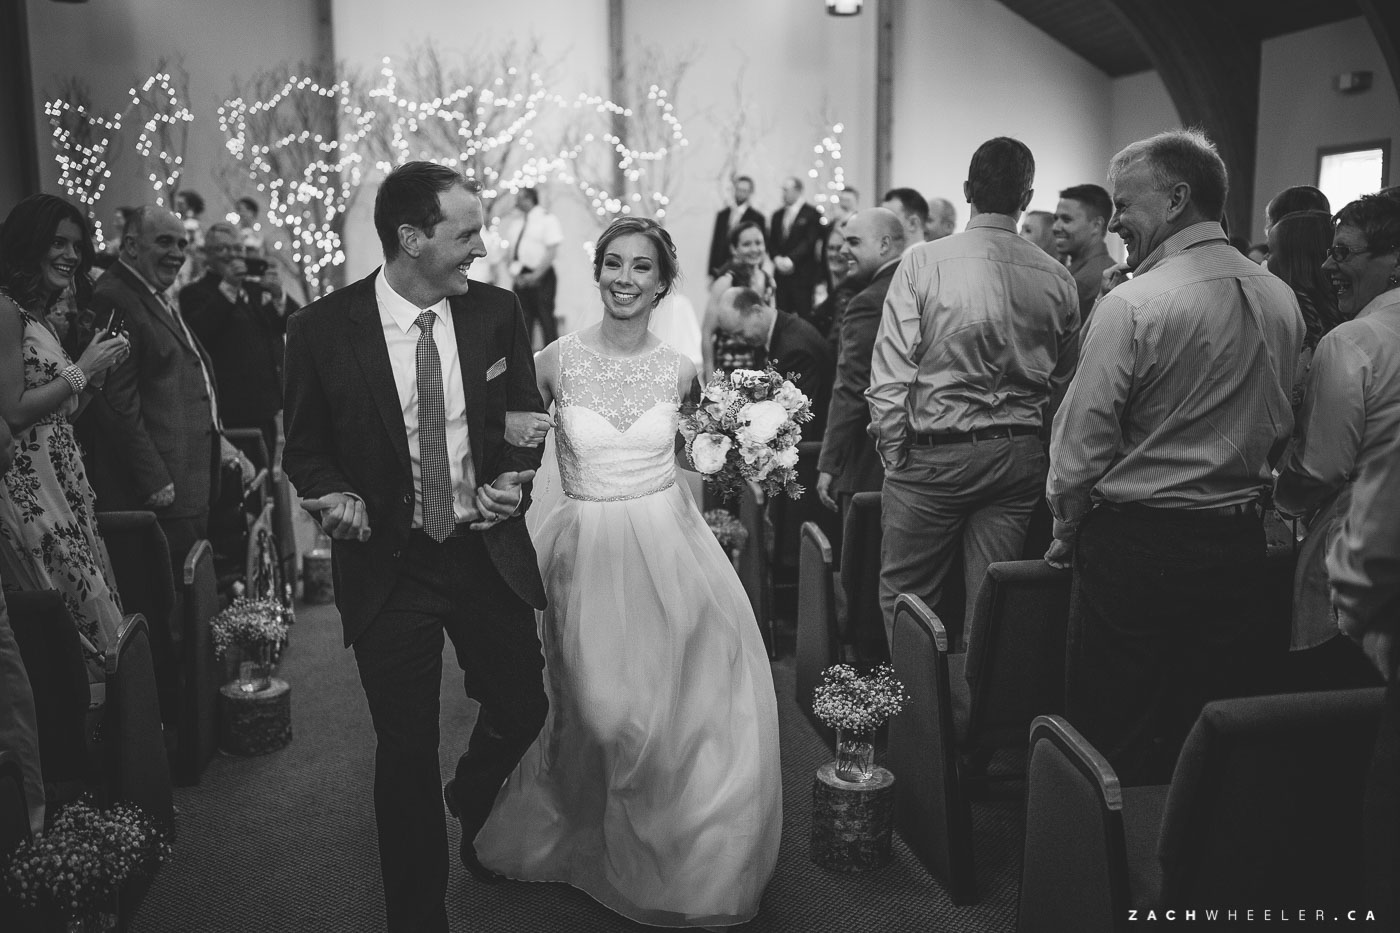 Sarah-Grant-Lesters-Fram-Wedding-38